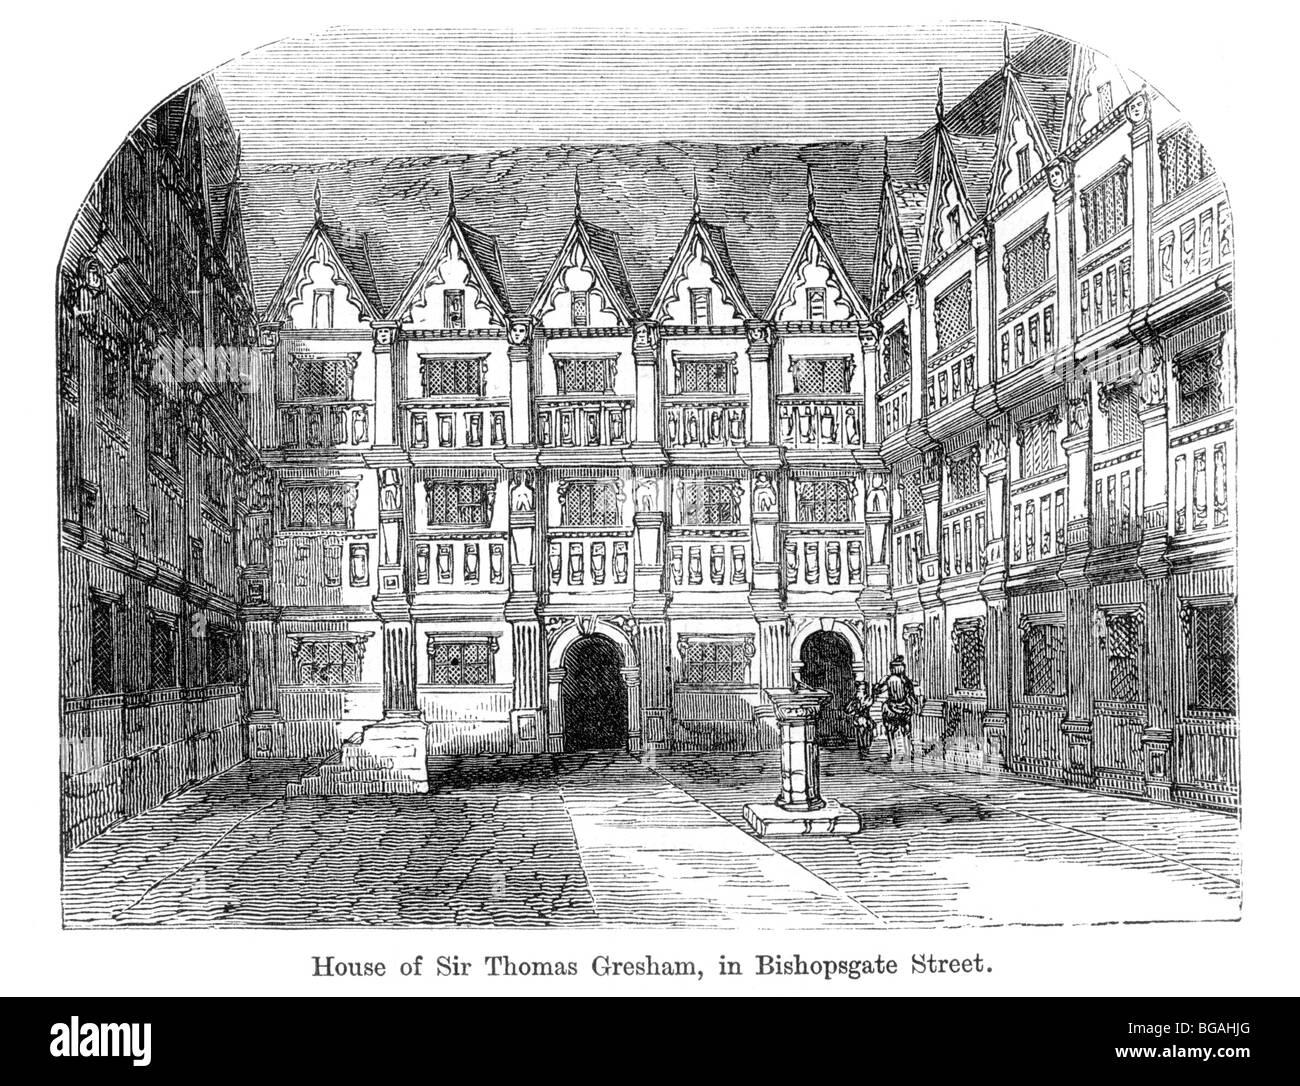 Illustration; House of Sir Thomas Gresham, Bishopsgate Street, London, erected in 1563 and demolished in 1768 Stock Photo